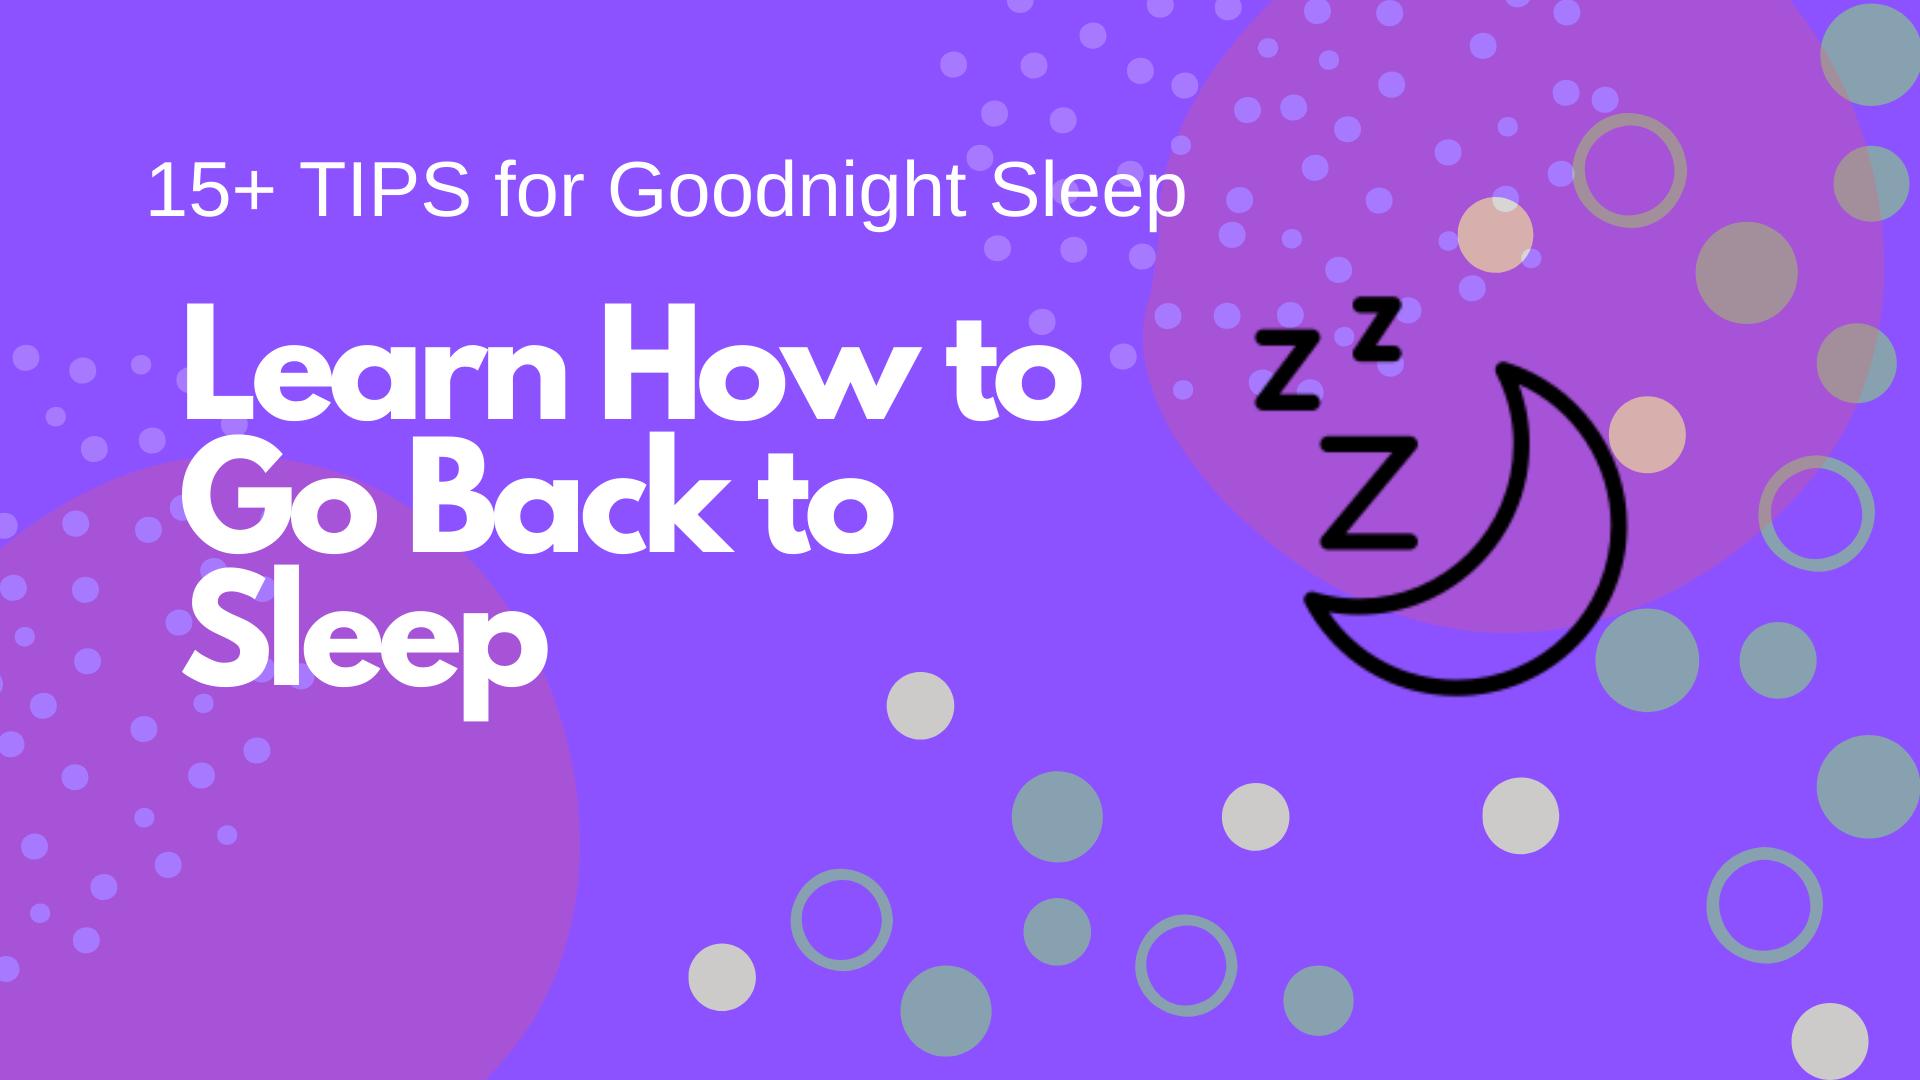 Learn how to go back to sleep